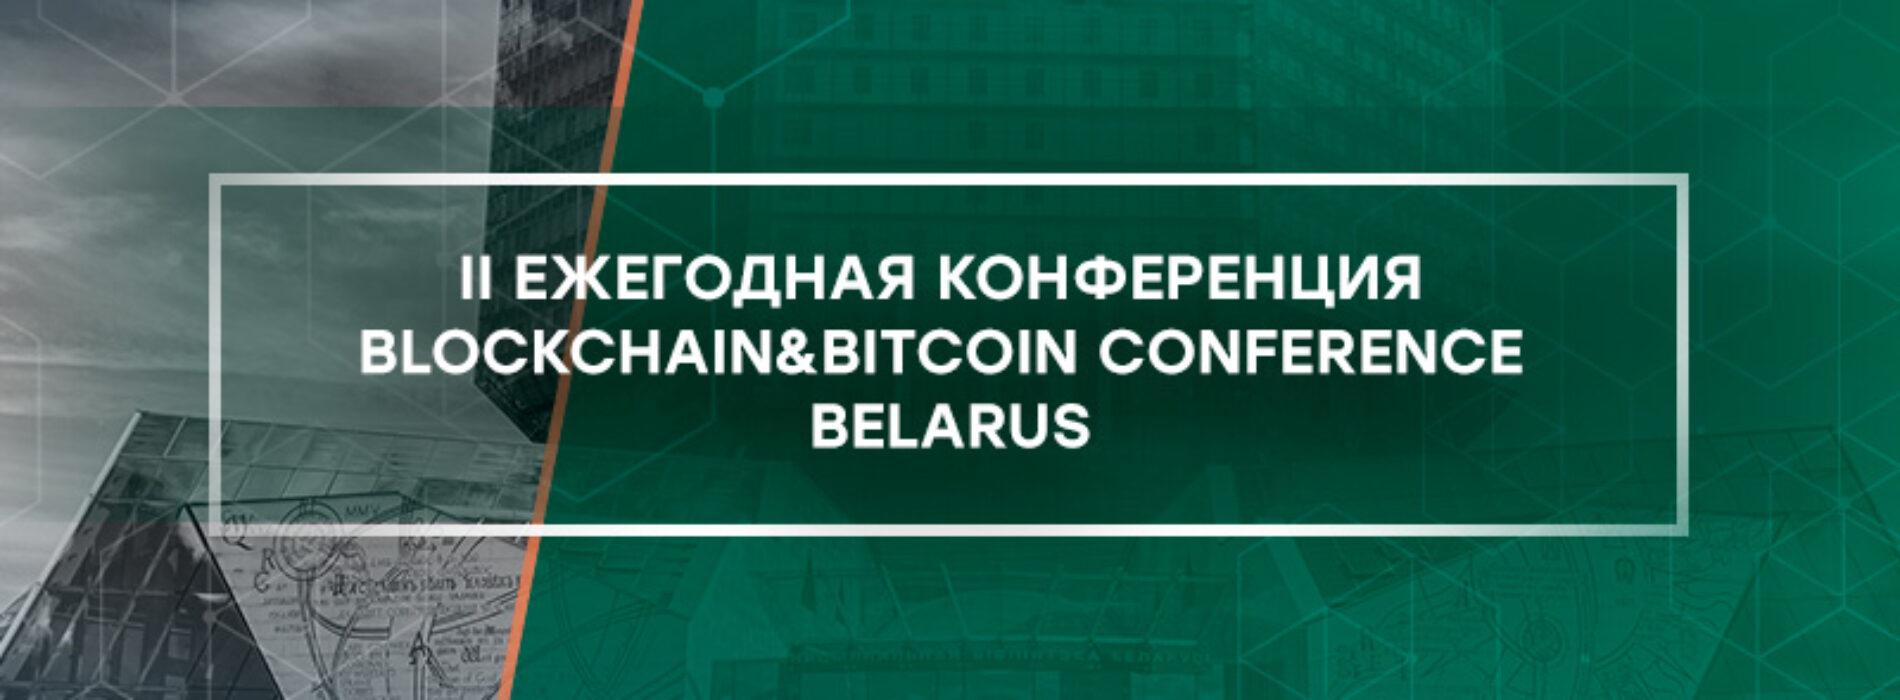 Blockchain & Bitcoin Conference Belarus